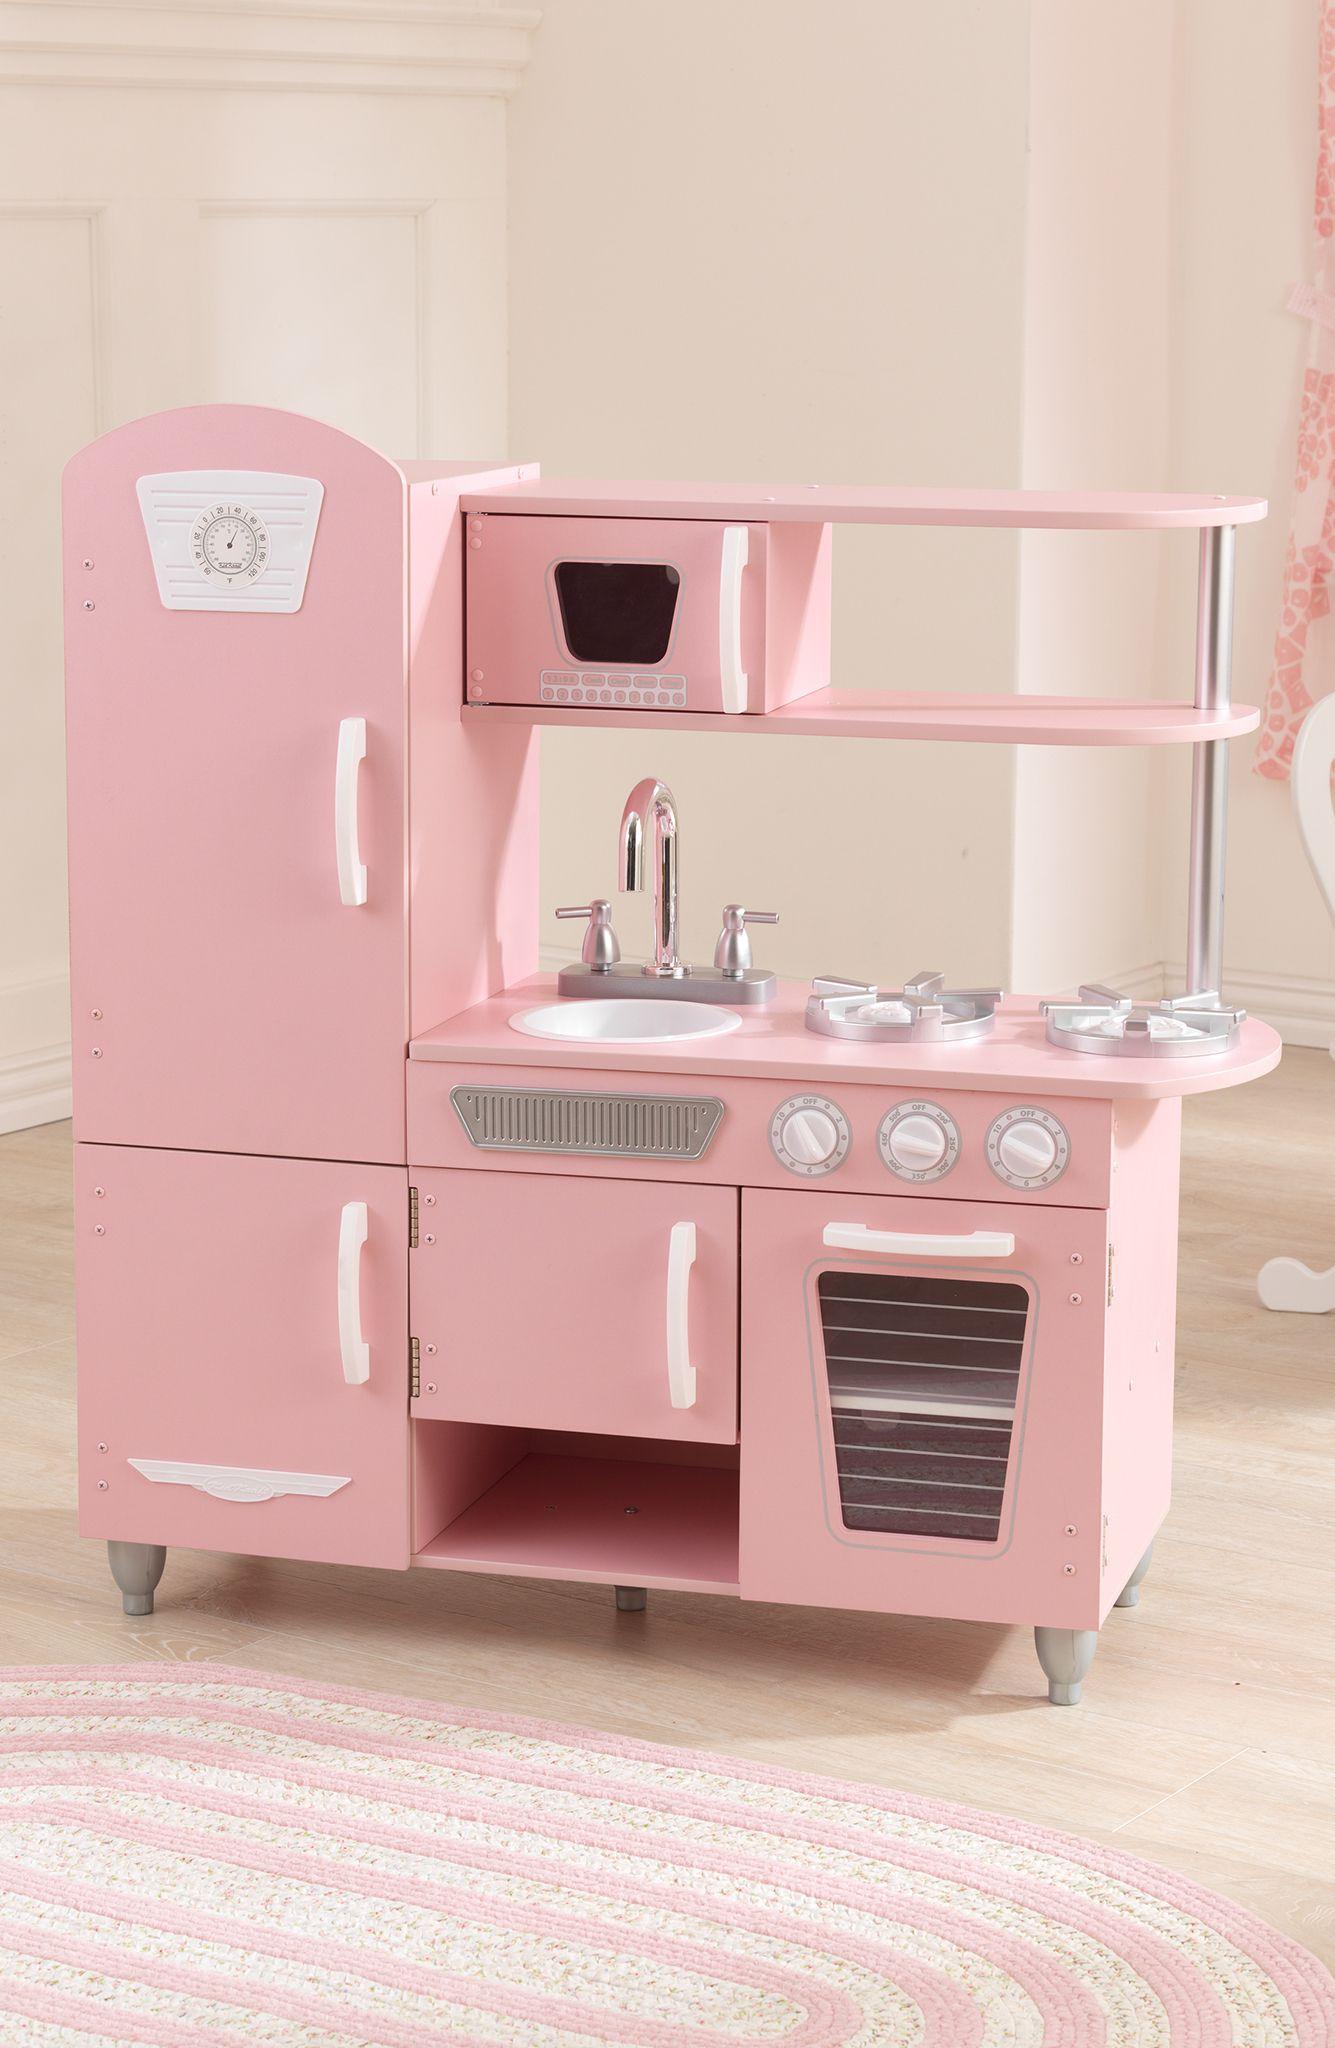 kidkraft vintage kitchen set only $75.59 shipped! (reg